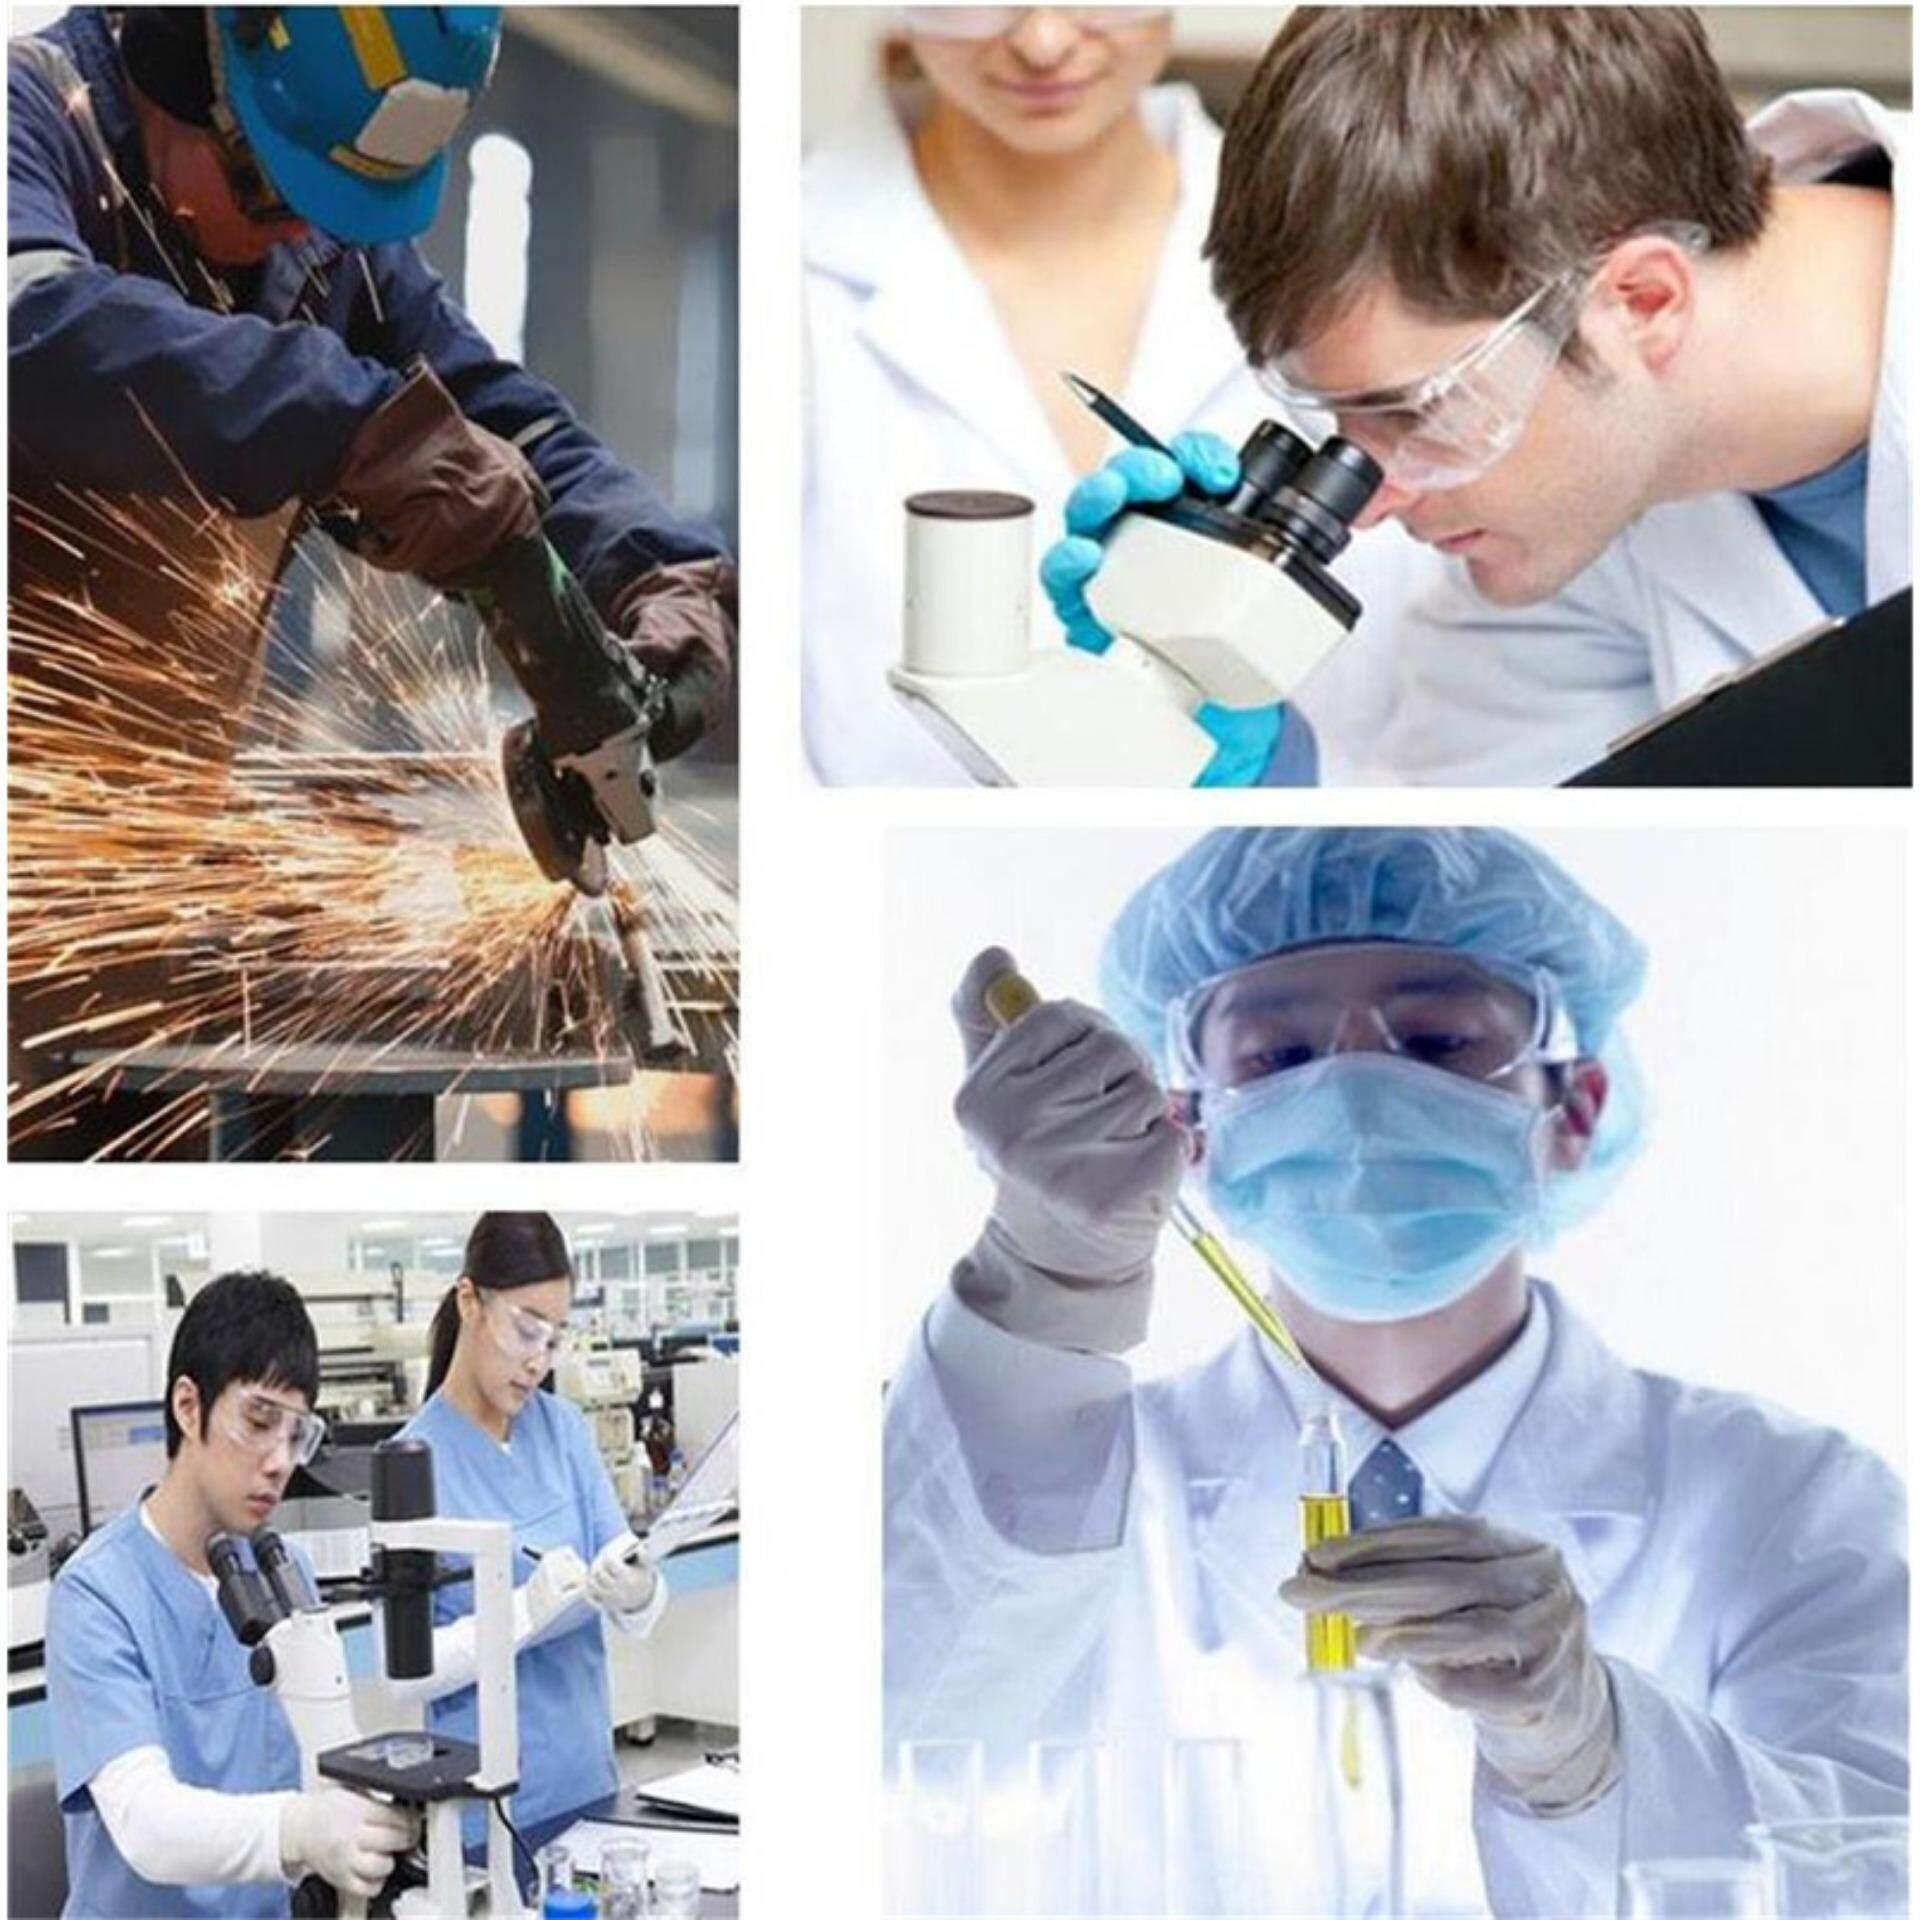 Orange Sunshine Workplace Safety Goggles Supplies Lab Eye Protection Protective Eyewear